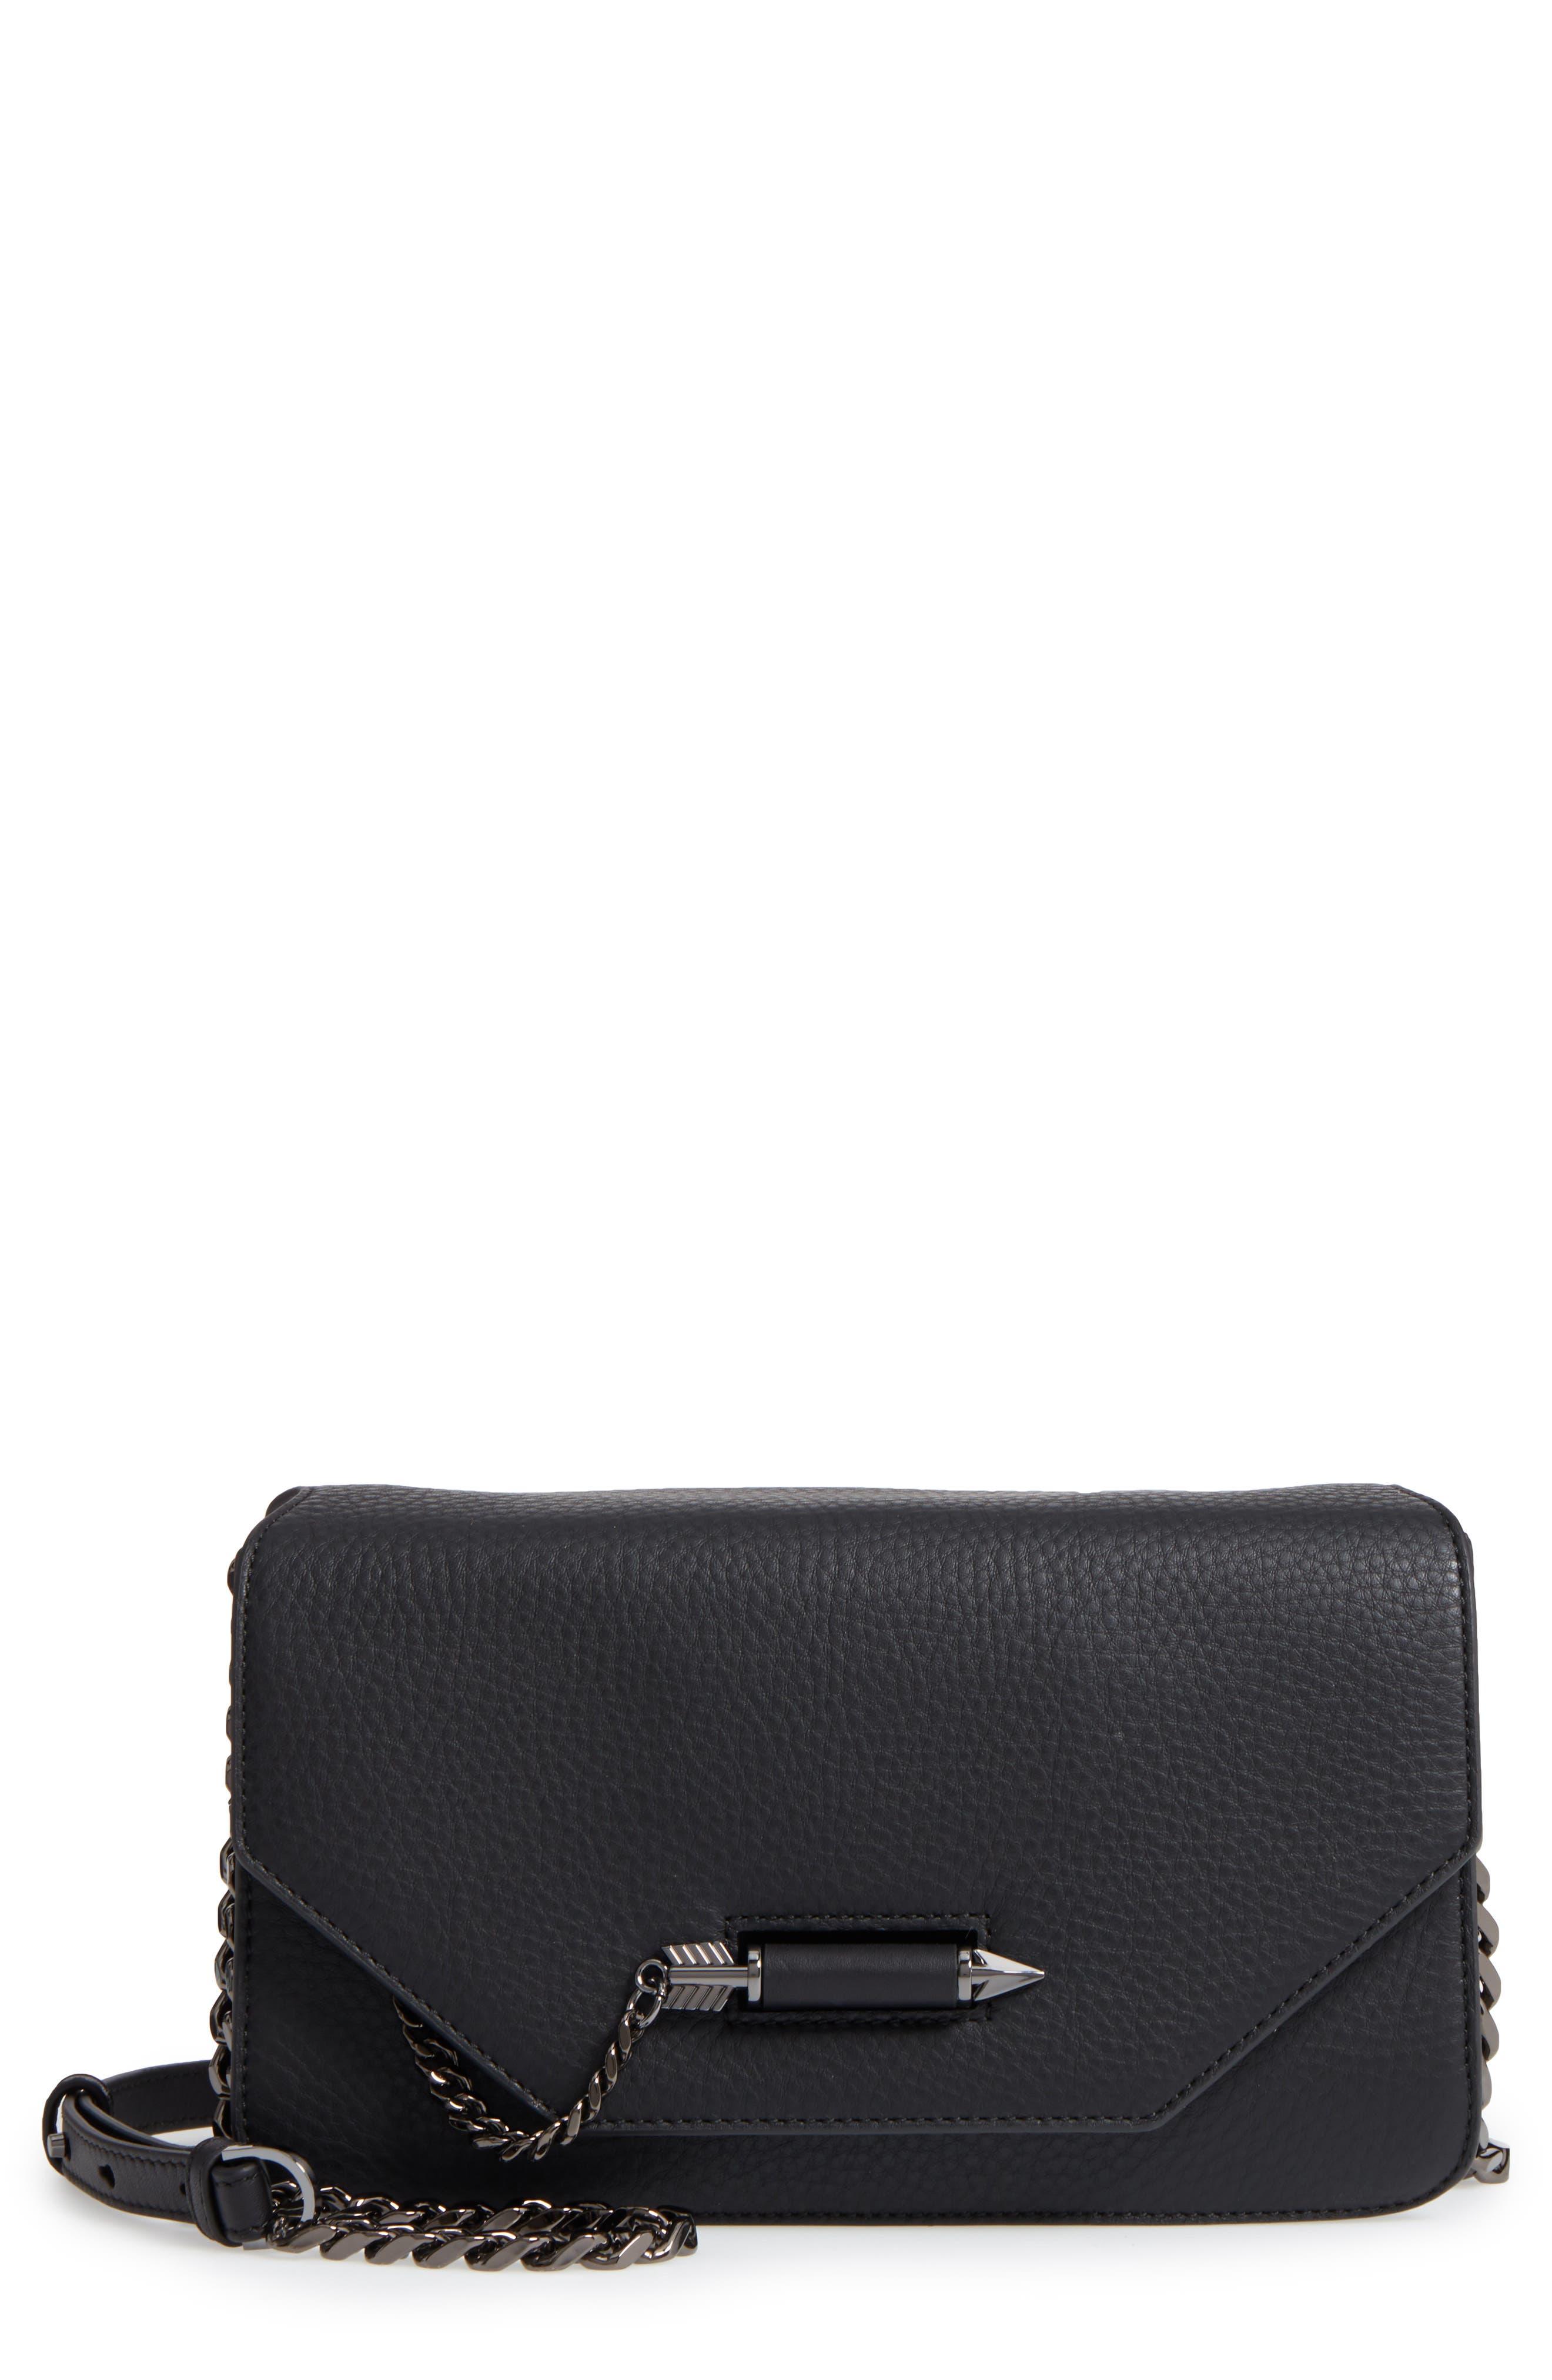 Cortney Nappa Leather Shoulder/Crossbody Bag,                             Main thumbnail 1, color,